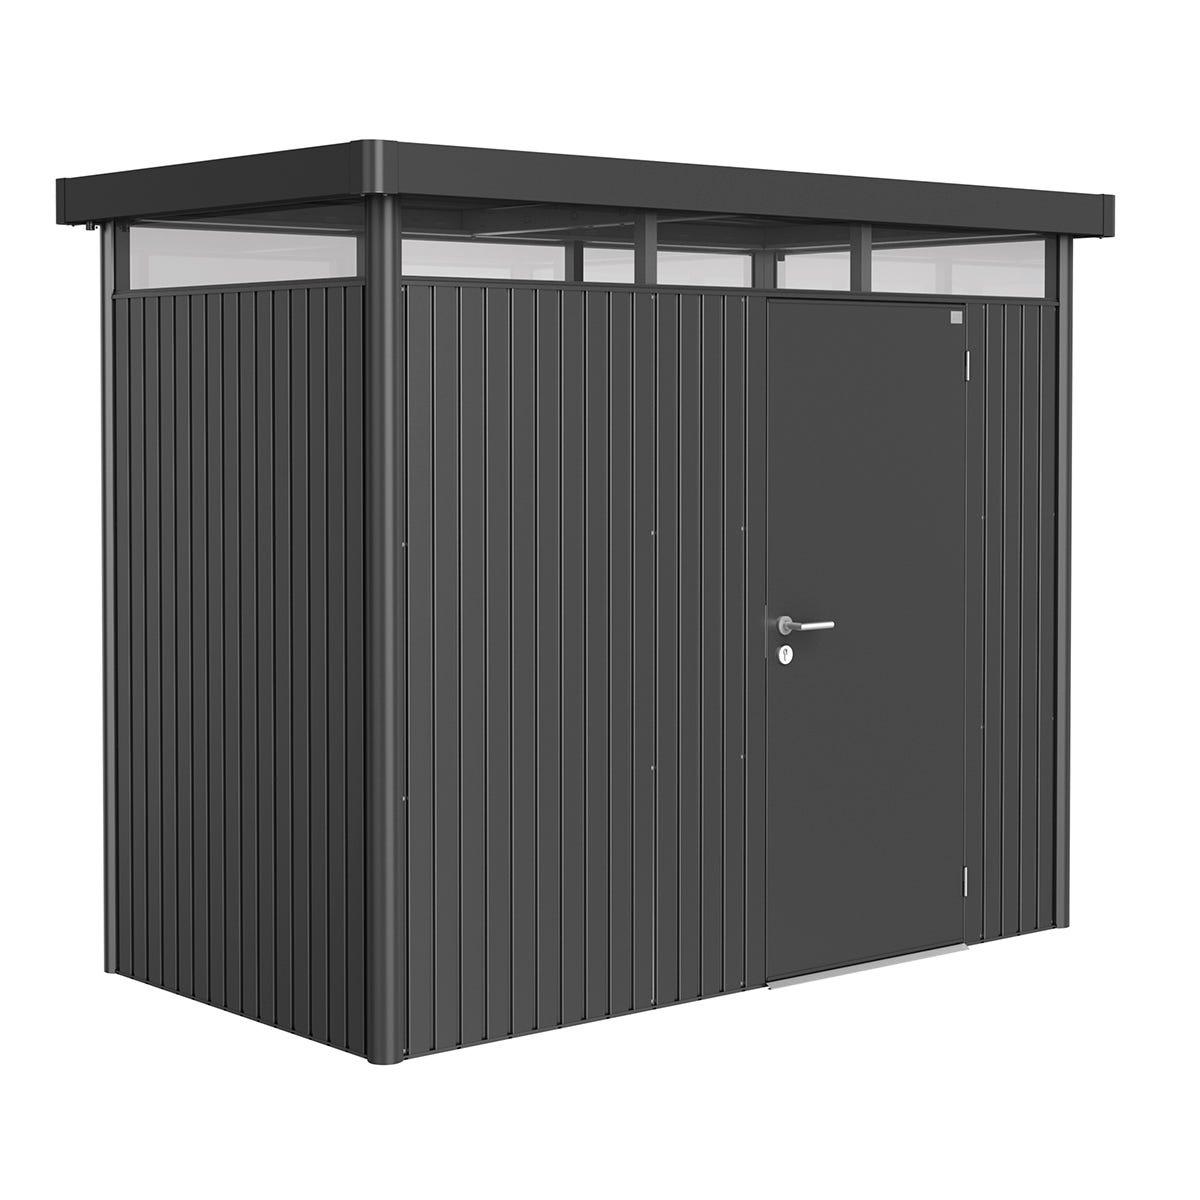 Biohort Highline Metal Shed H1 Standard door 9 x 5 - Dark Grey